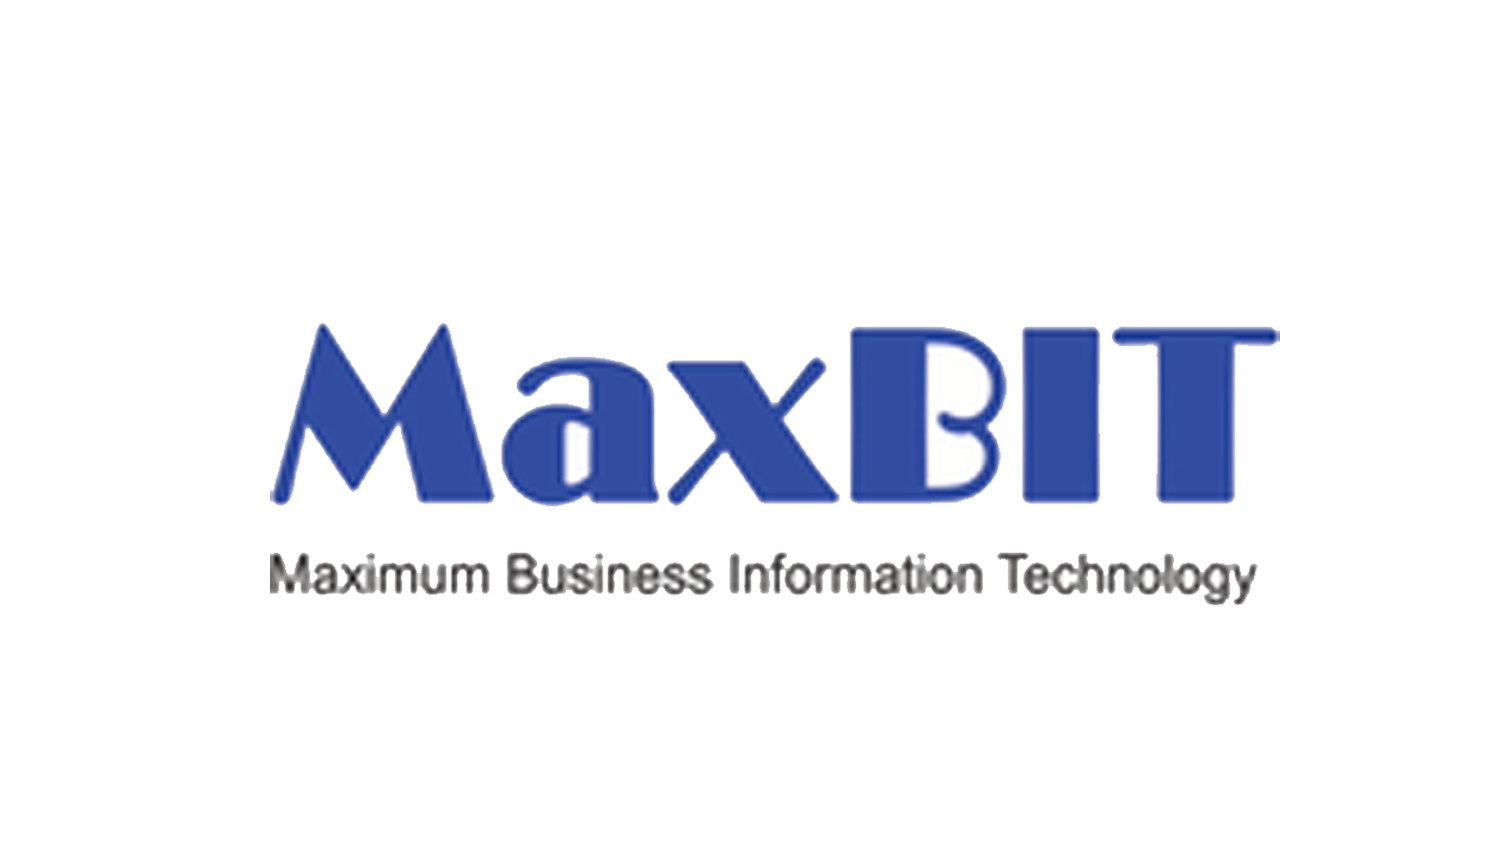 MaxBIT